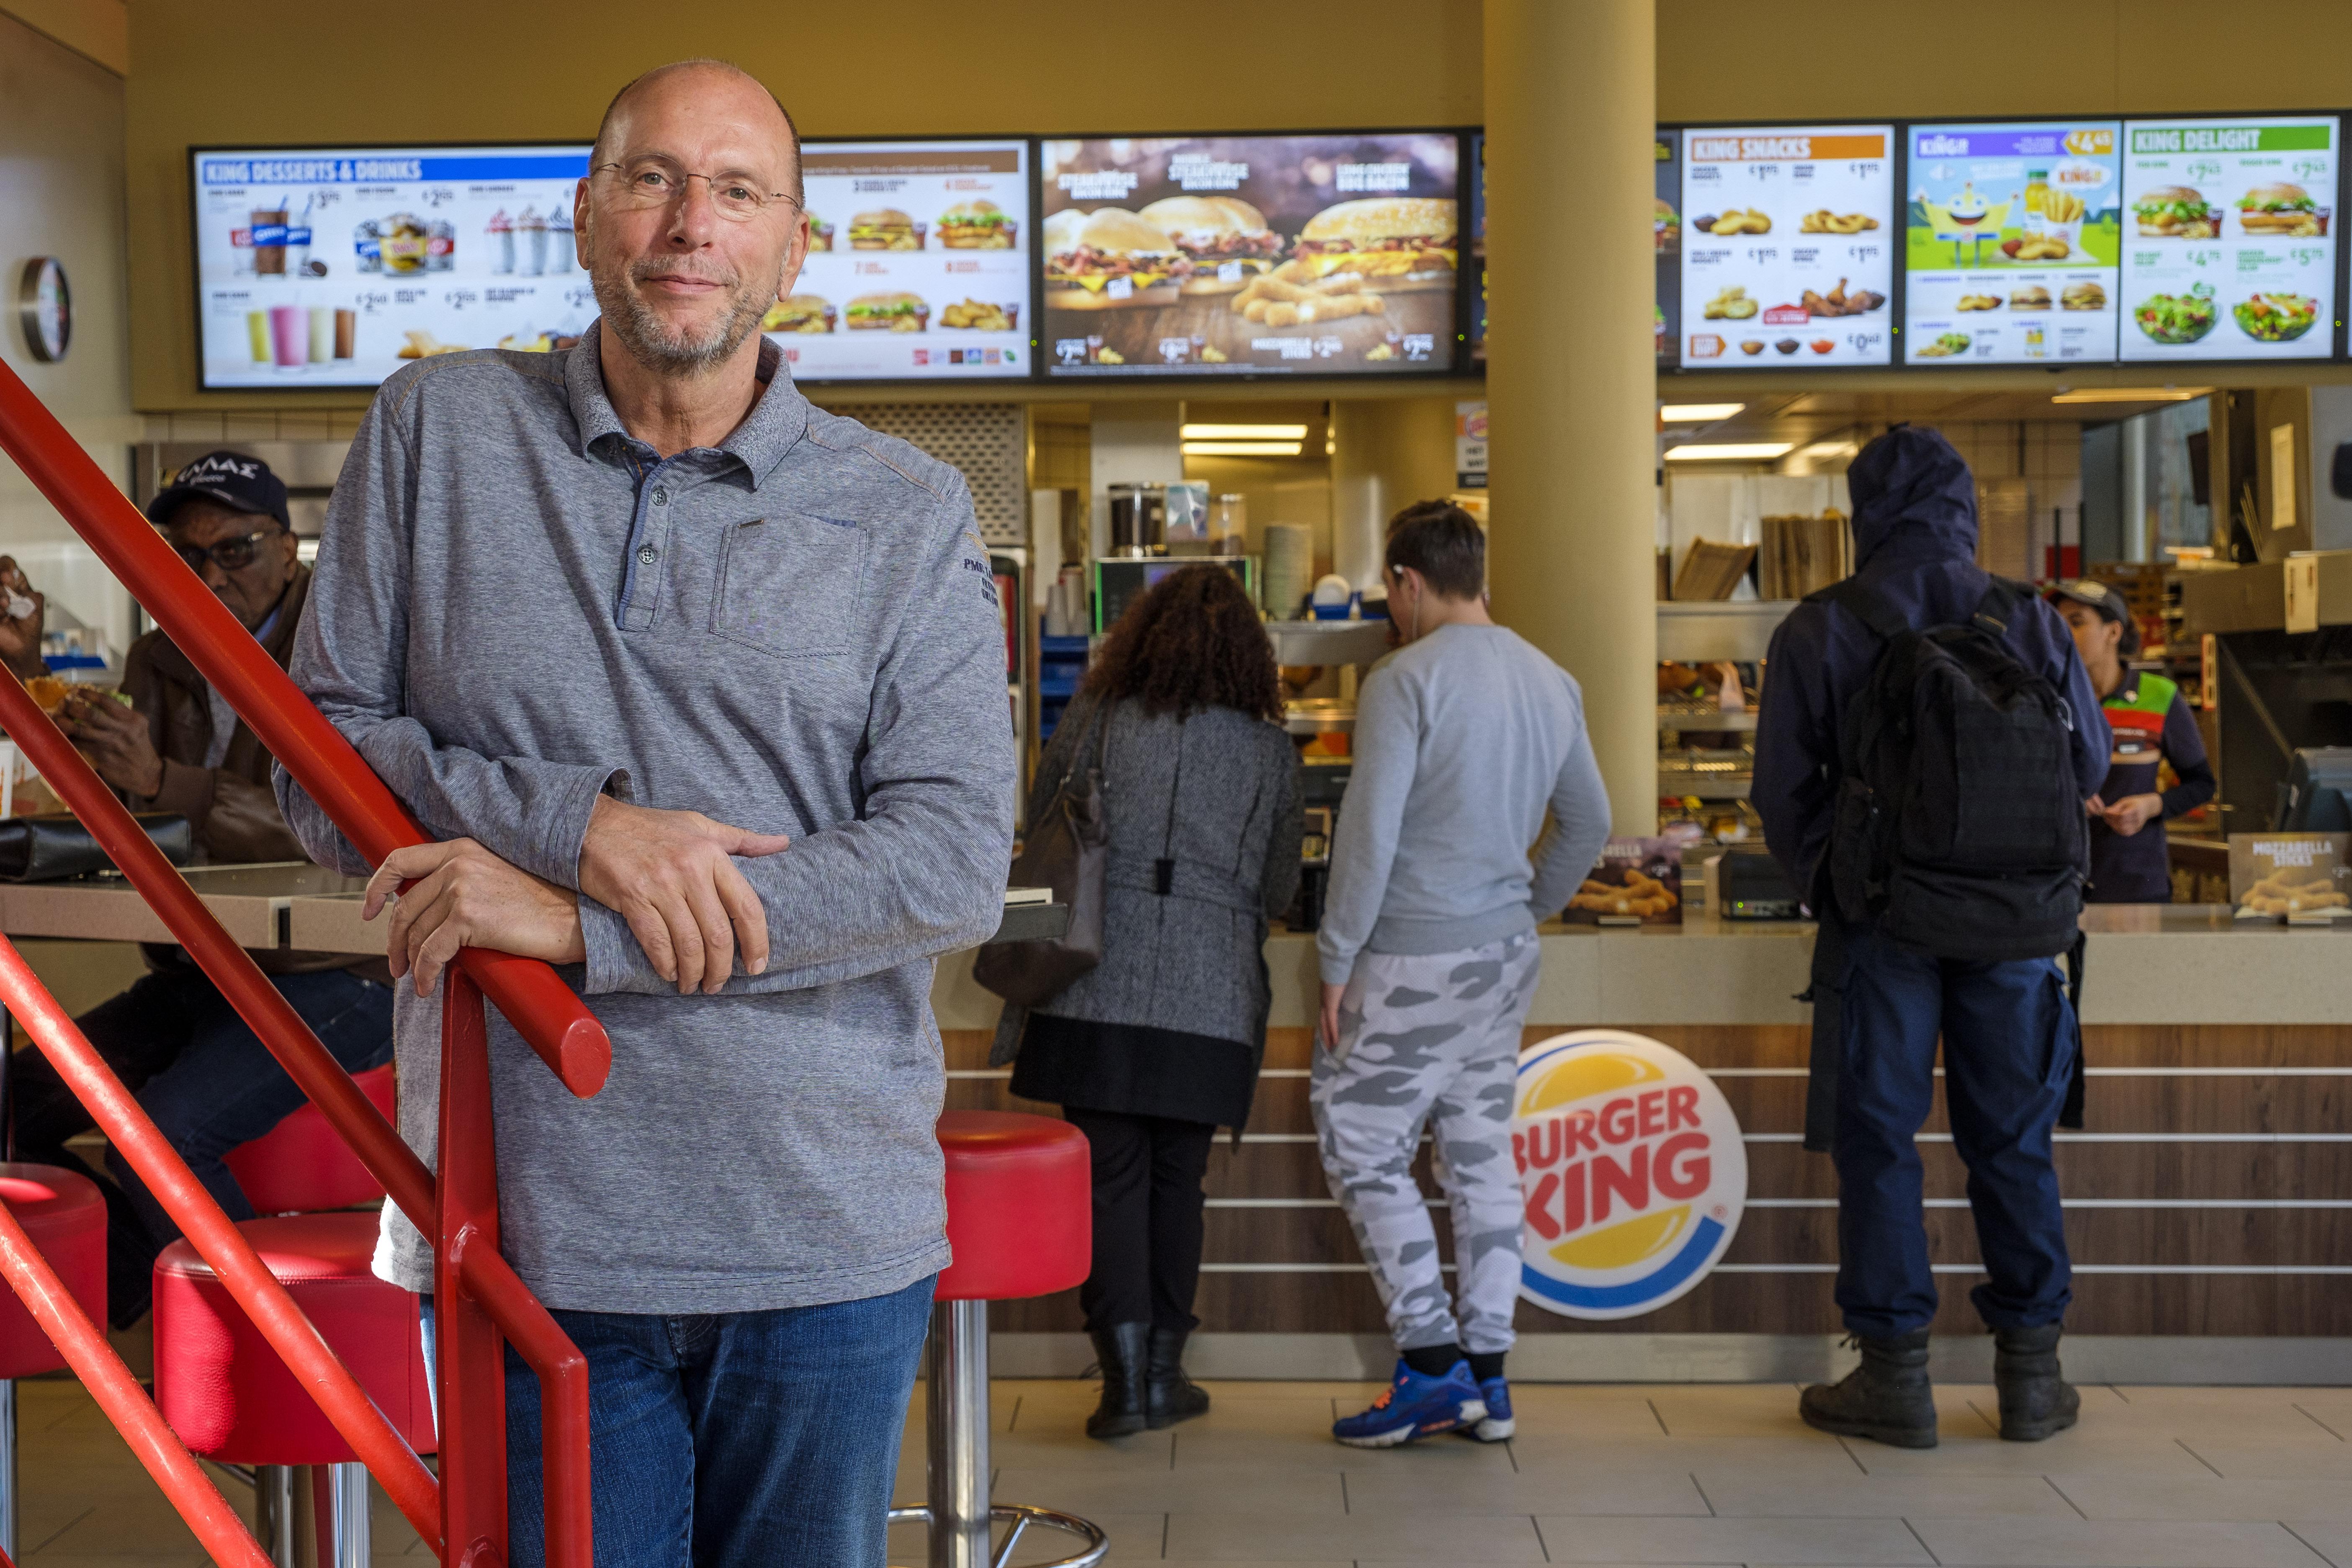 'Burger King ver achtergebleven'